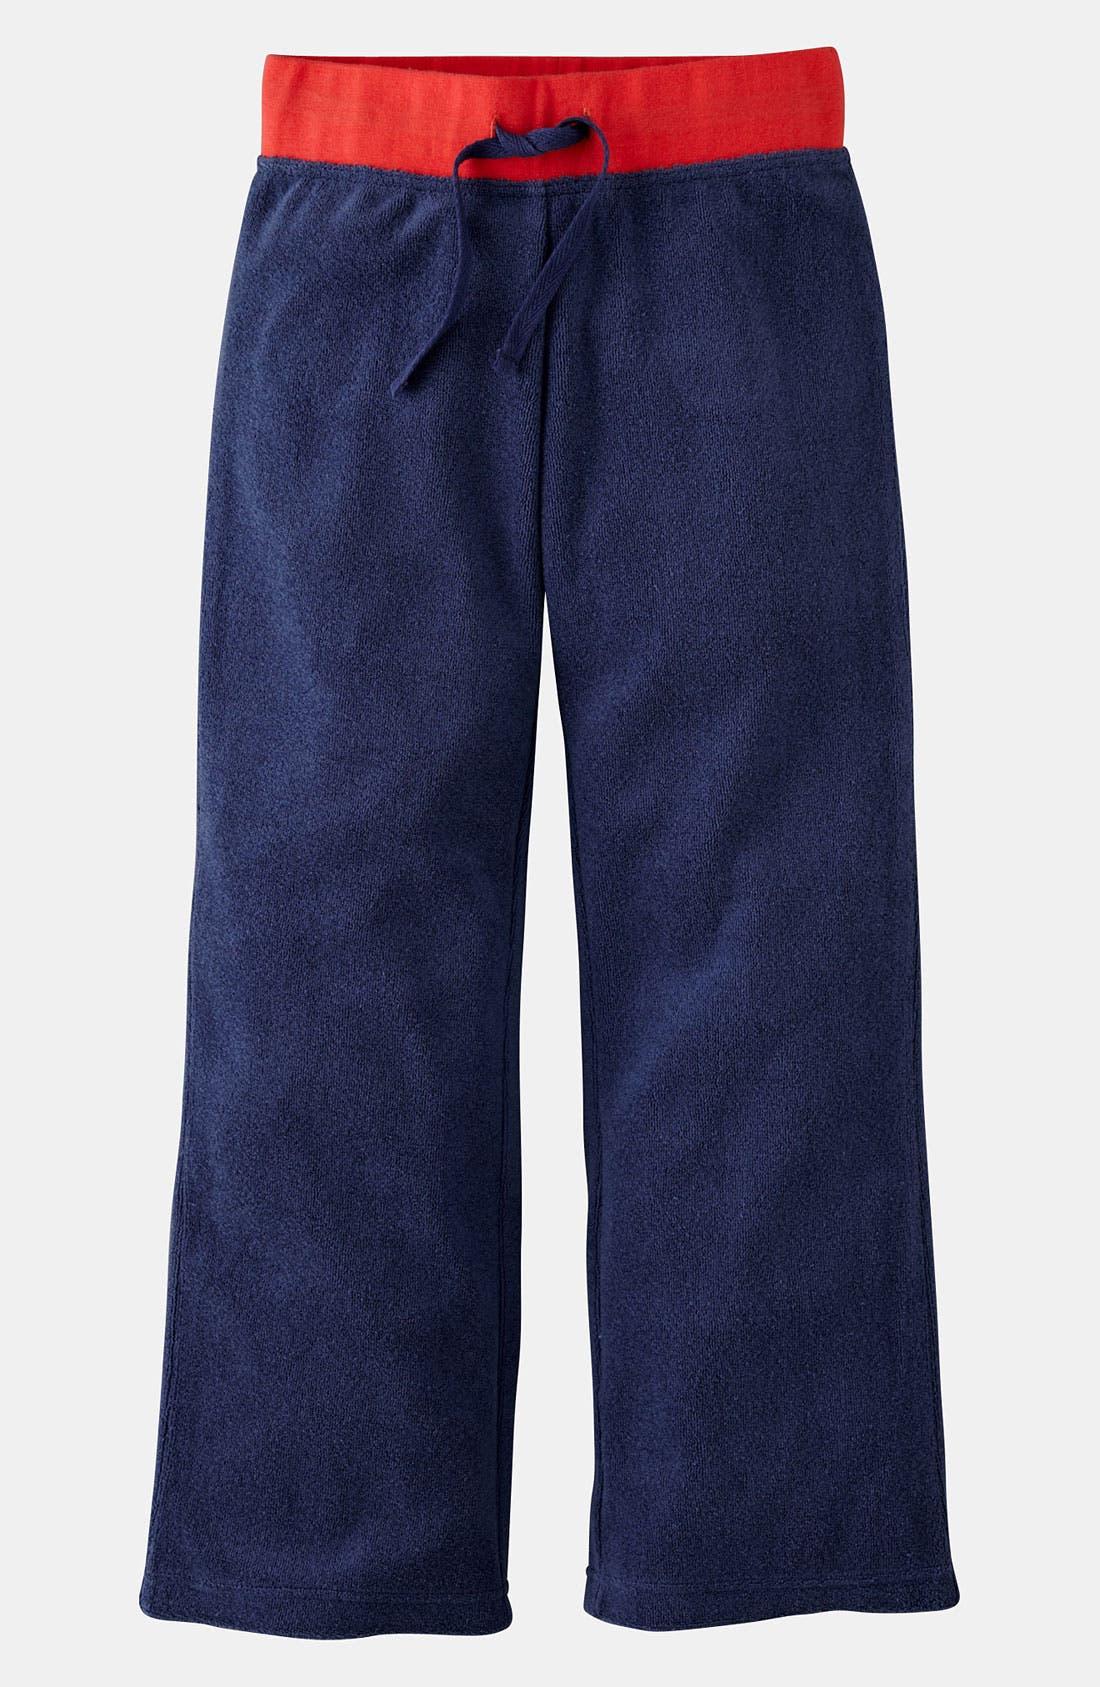 Alternate Image 1 Selected - Mini Boden 'Toweling' Pants (Little Girls & Big Girls)